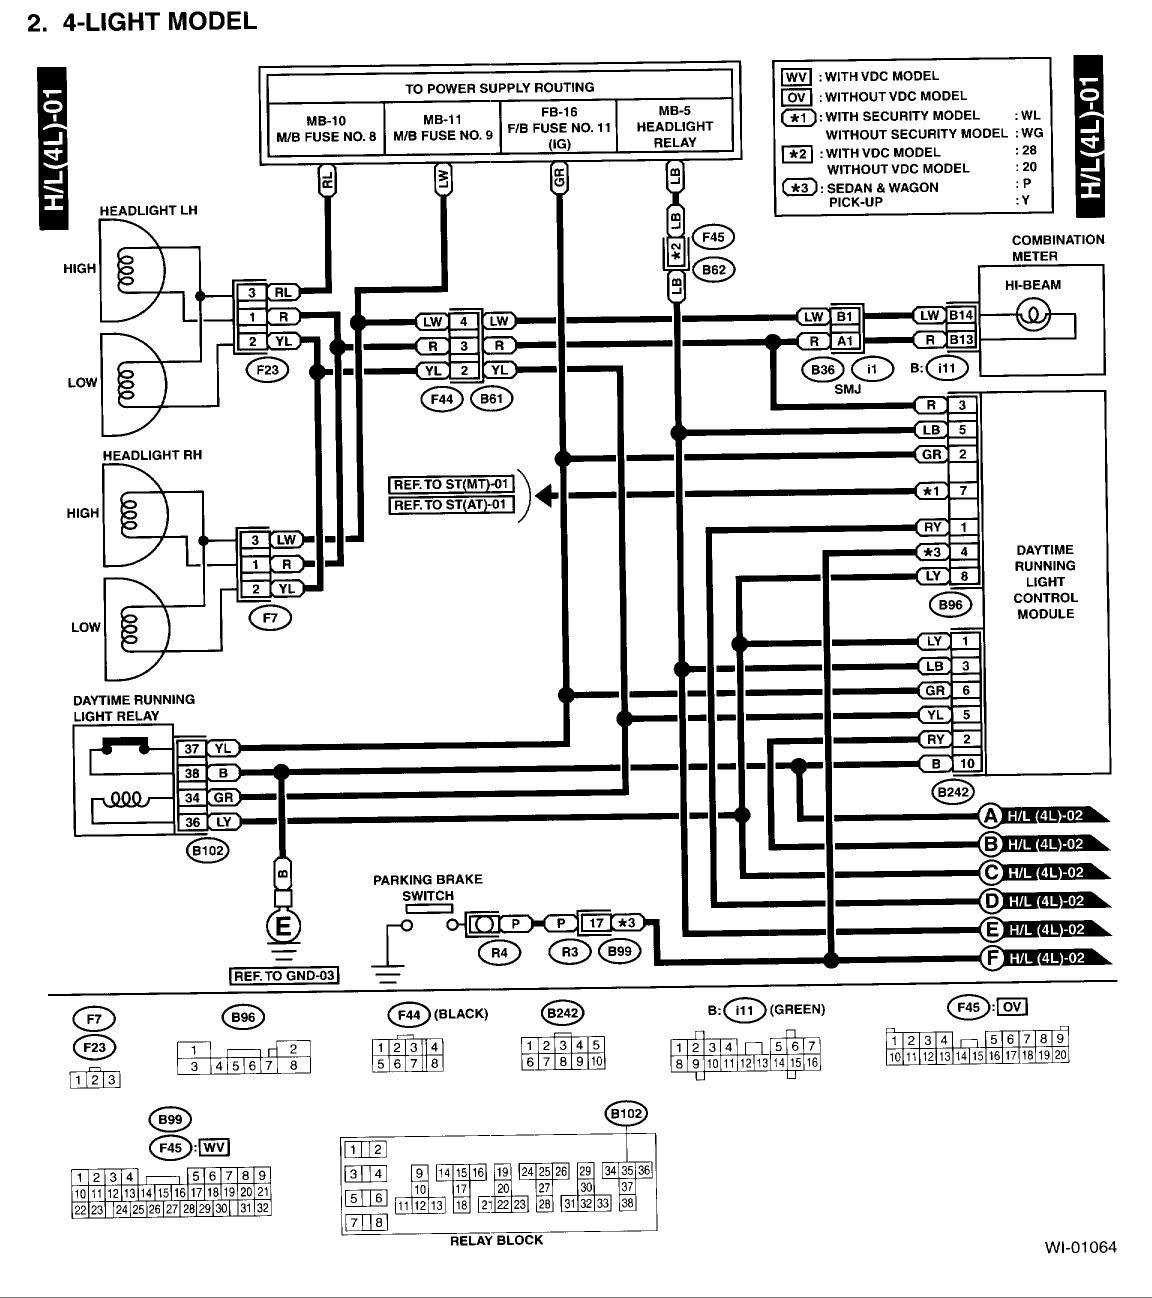 2015 Subaru Legacy Wiring Harness - Wiring Diagrams Information